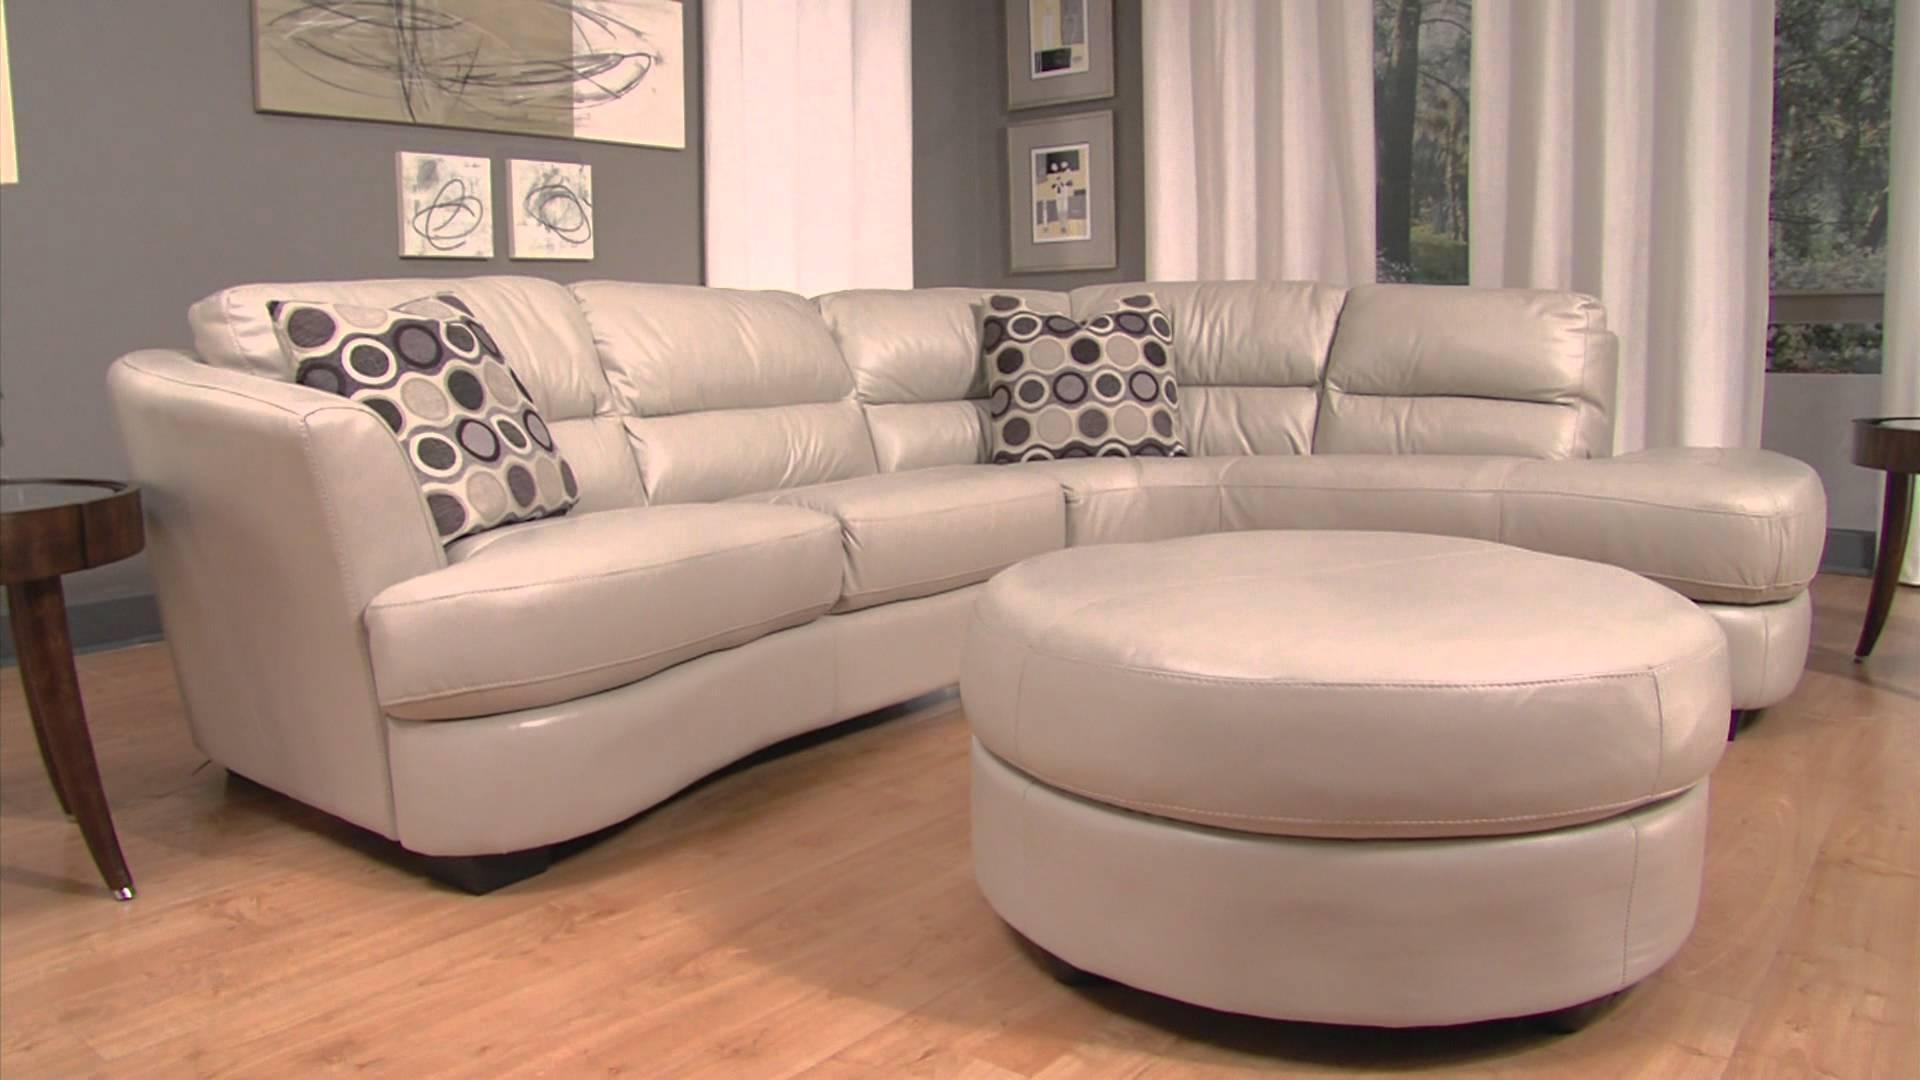 Berkline Andlynn Sofa Set Costco 3 Berkline Andlynn Sofa Set With Berkline Sofas (Image 1 of 20)